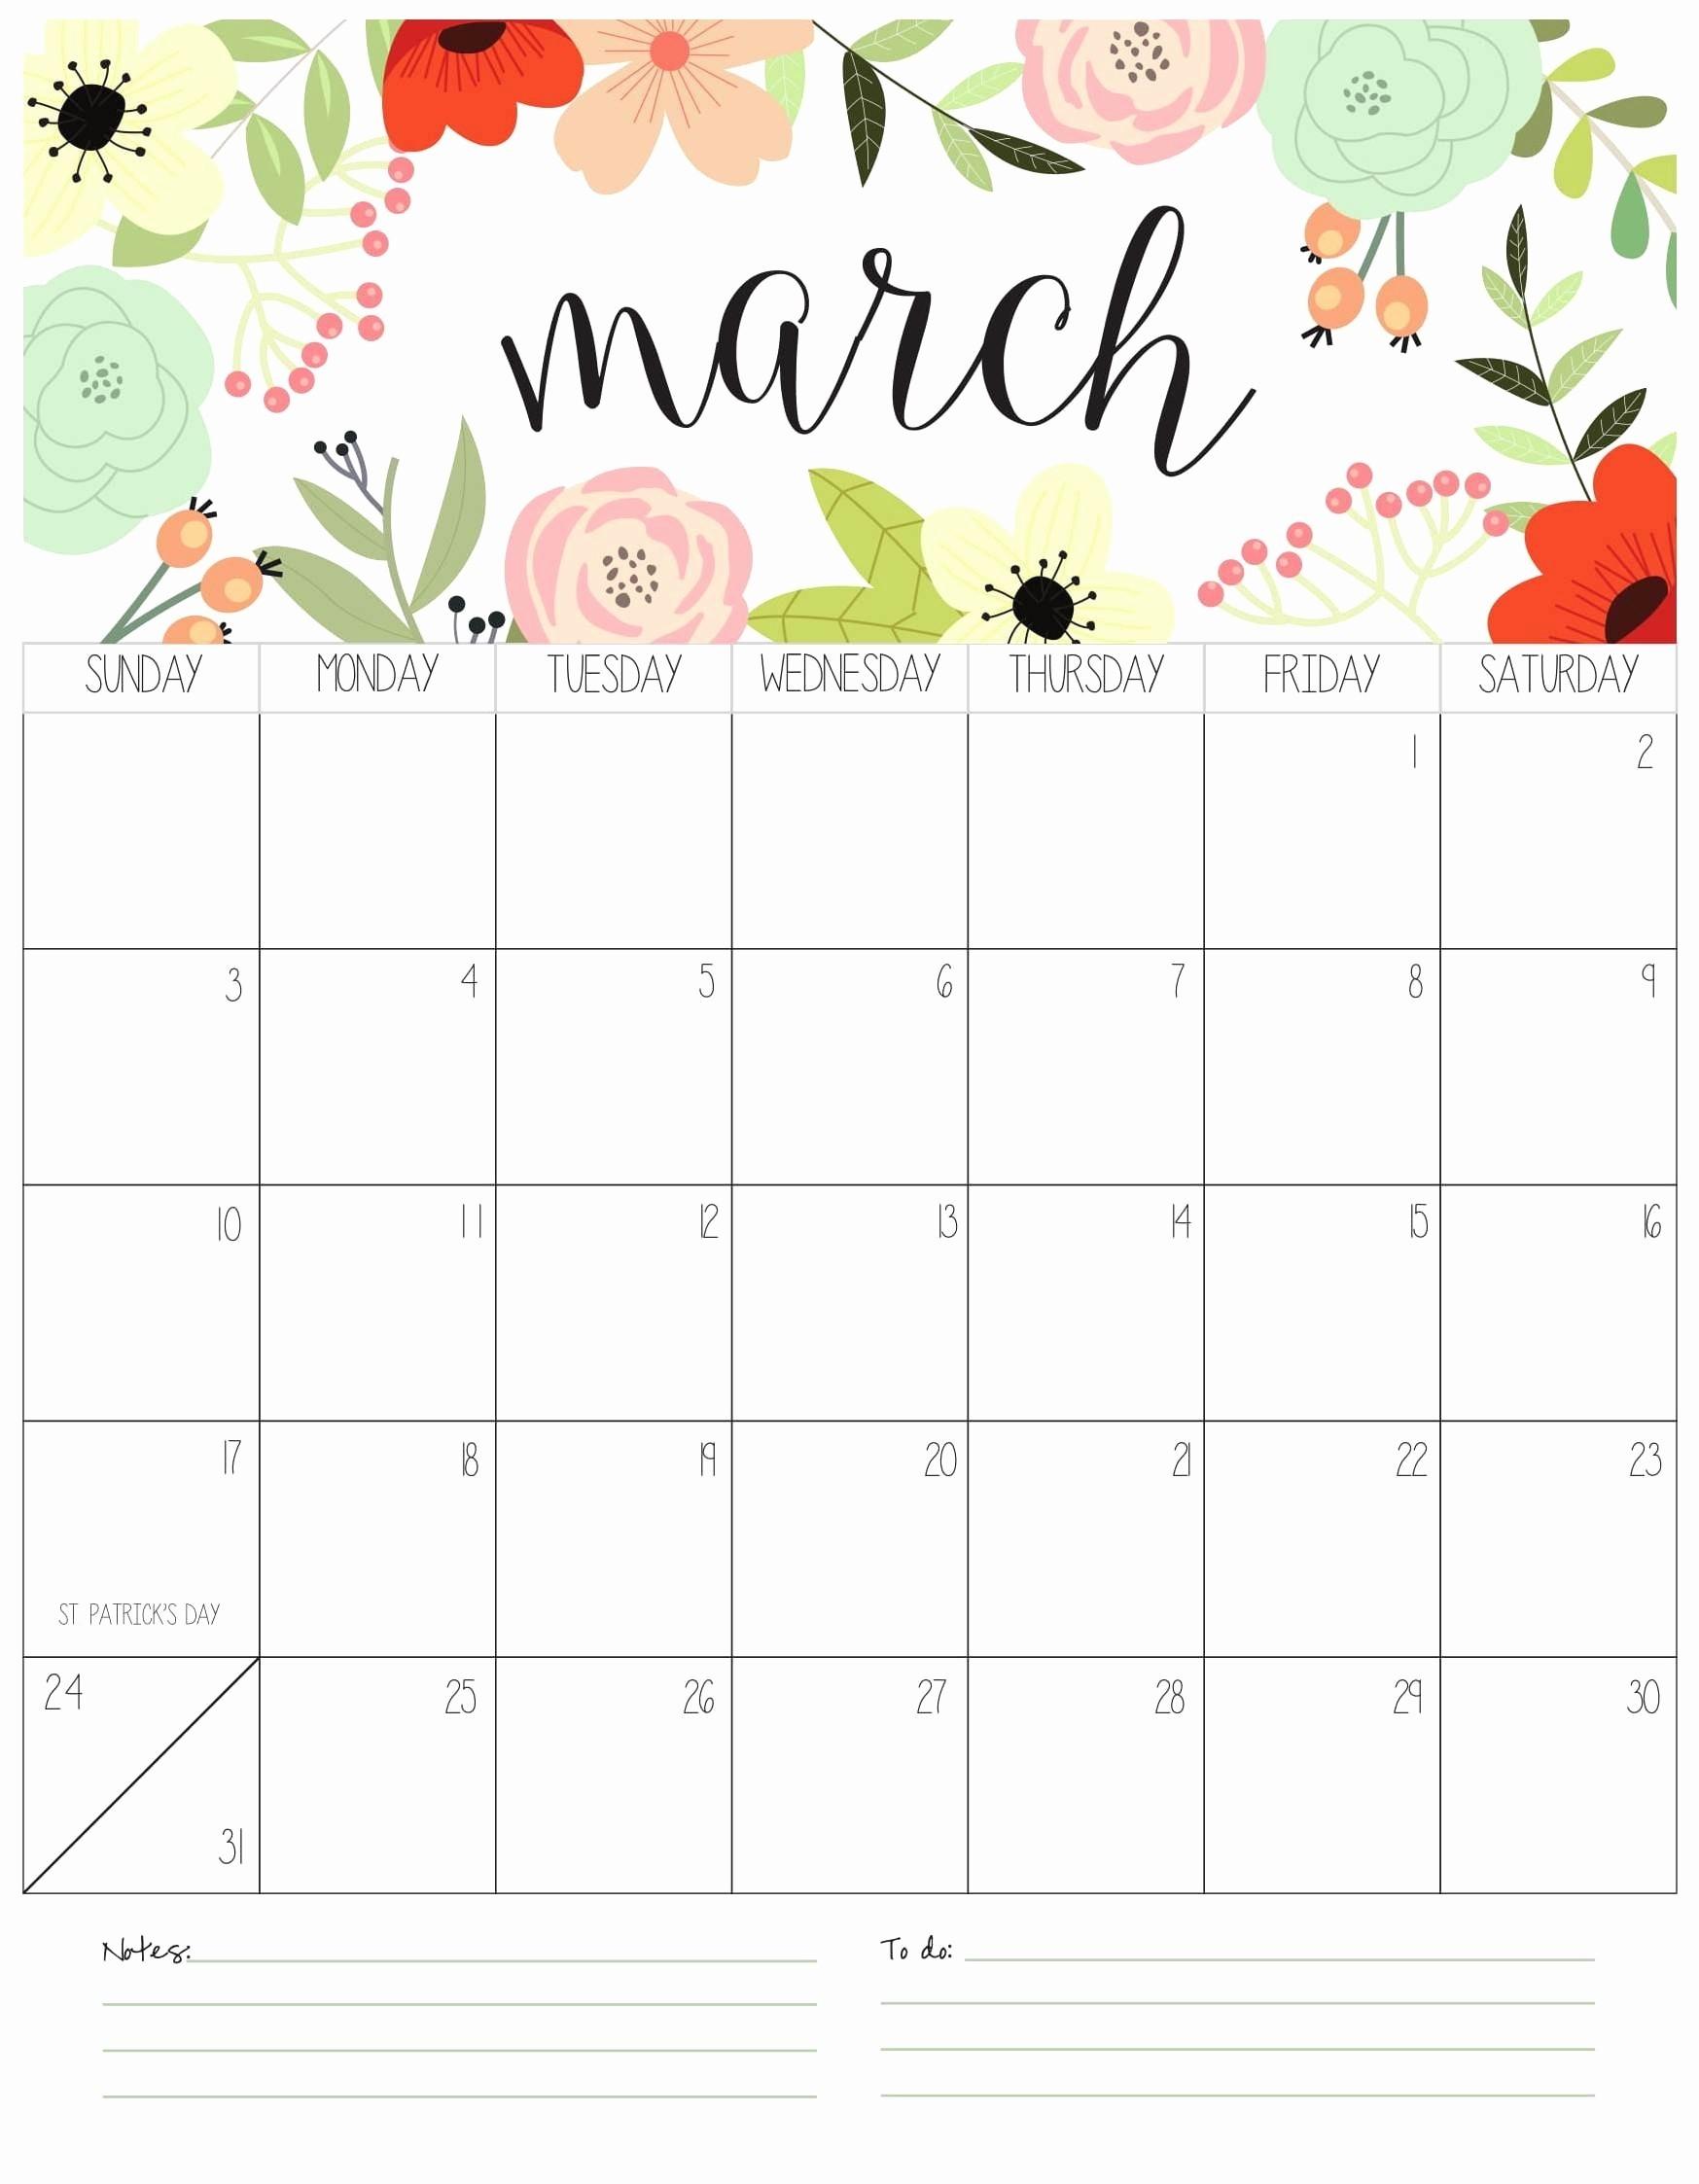 National Food Day July 2019 Calendar Printable | Calendar-National Monthly Calendar For Food